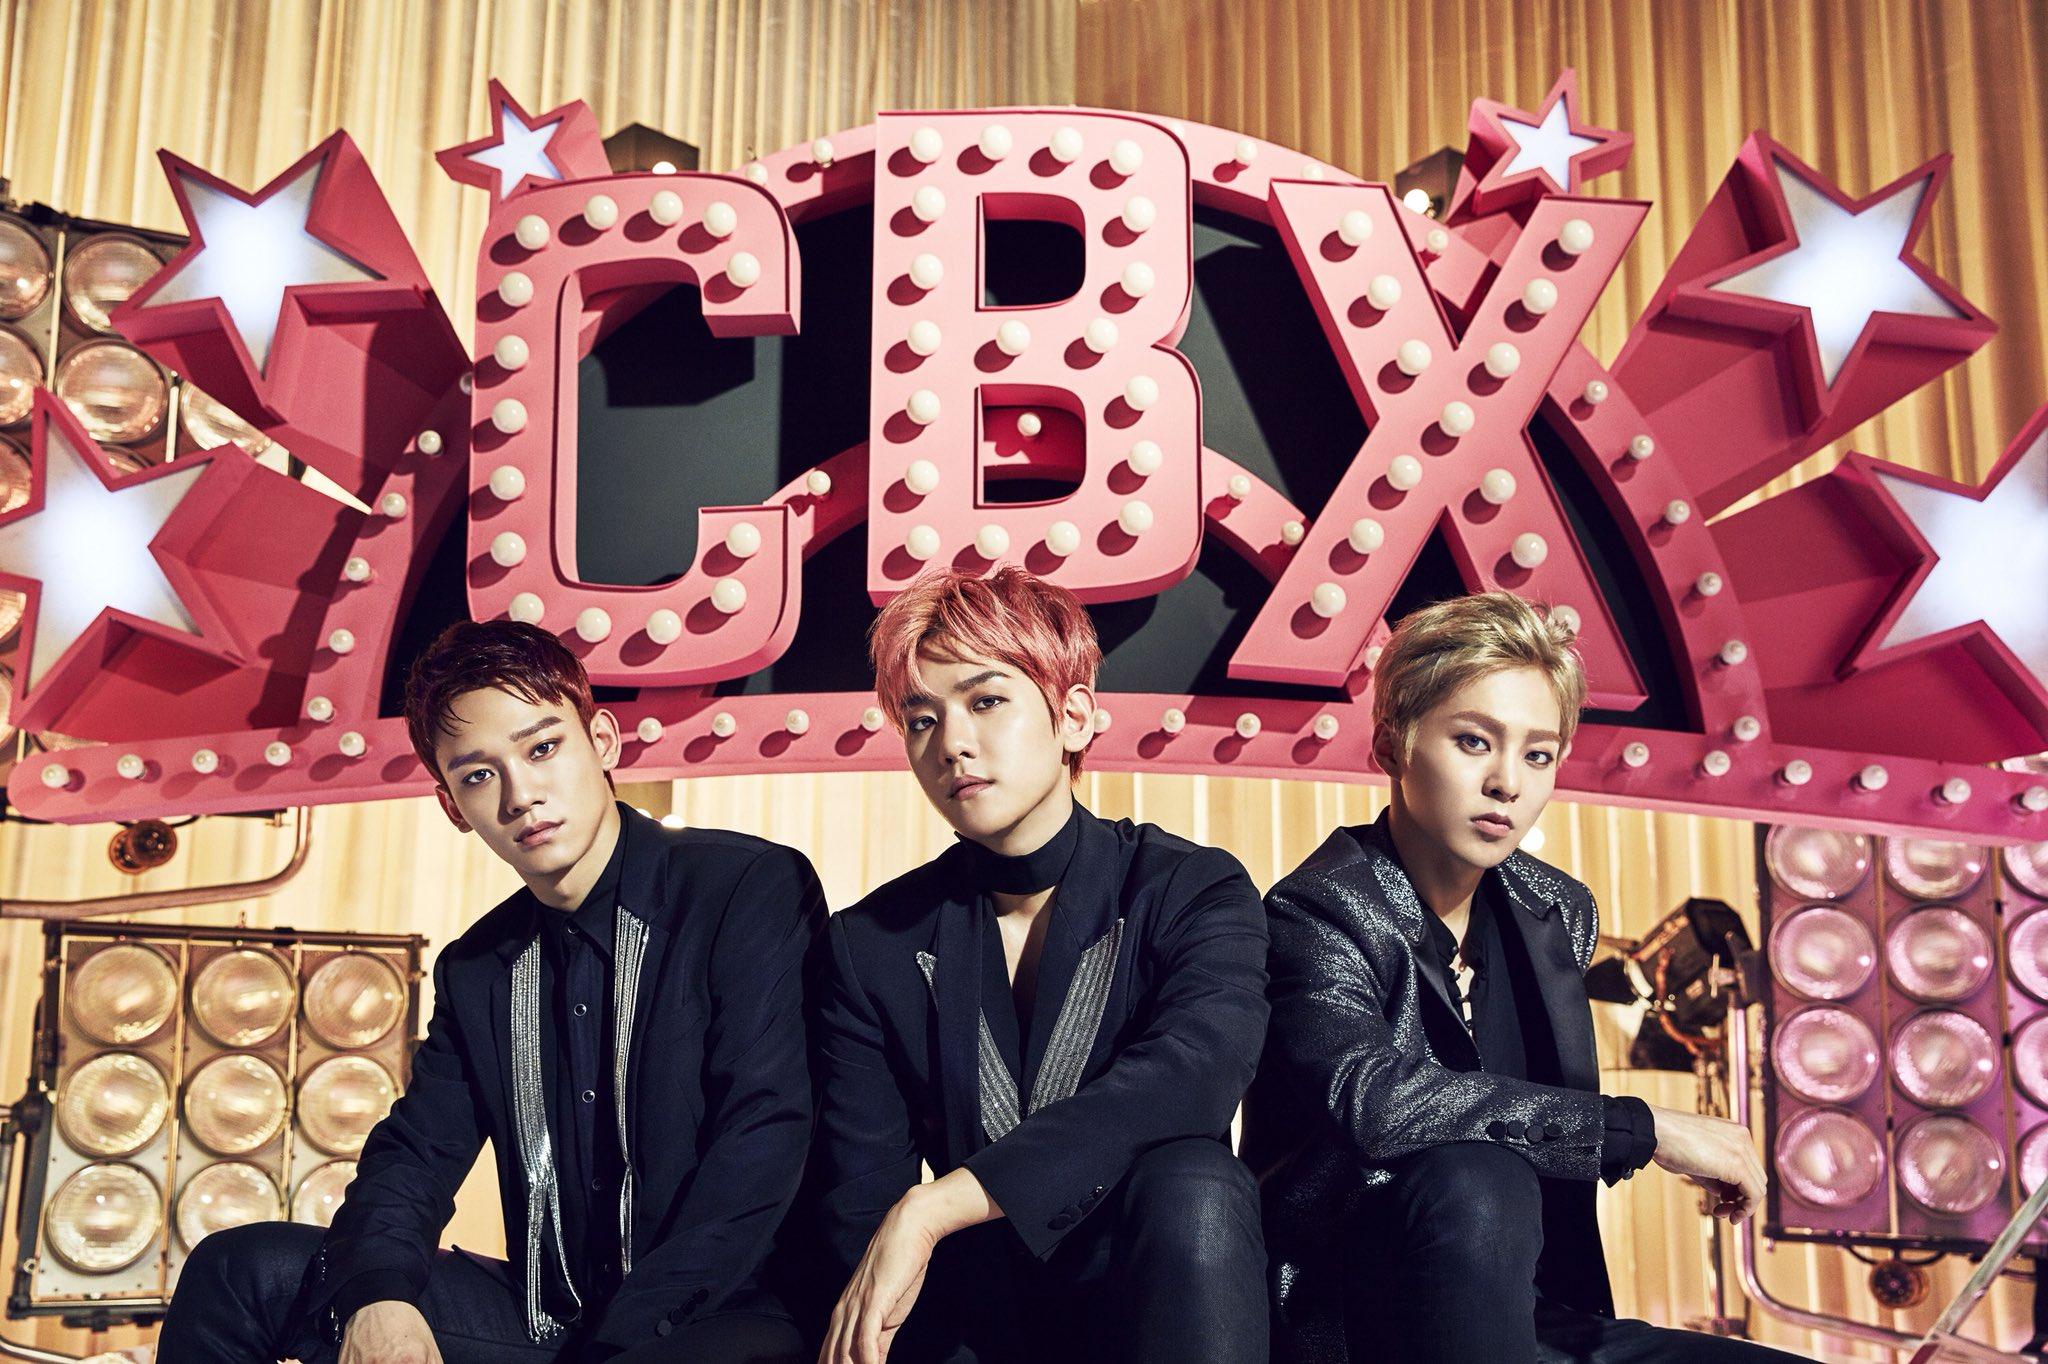 EXO-CBX↓ンリ ↓ンᄐ→ᄈᄌ ↓ᄇᆱ ↓ᅠユ↑ᄋワ ↓ユᄄ→ᄇヤ ¬タリMAGIC¬タル↓ンᄡ ↓リᄂ→ᆭᆲ↓ᄑリ ↓ワト■チᄡ→ᆭᆲ ↓ユᄄ→ᄇヤ ↓ᄚᄄ■ハᄌ↓ラミ↓トワ ↓ᄇᆱ 1↓ワト→ᆬᄐ ↓ᄚᄄ↓ᄃタ■ヨネ↓ハᄉ→ヒネ→ヒᄂ!゚ムマ゚マニ  #EXO #EXO_CBX #CHEN #BAEKHYUN #XIUMIN #MAGIC https://t.co/4XKUzJf01U